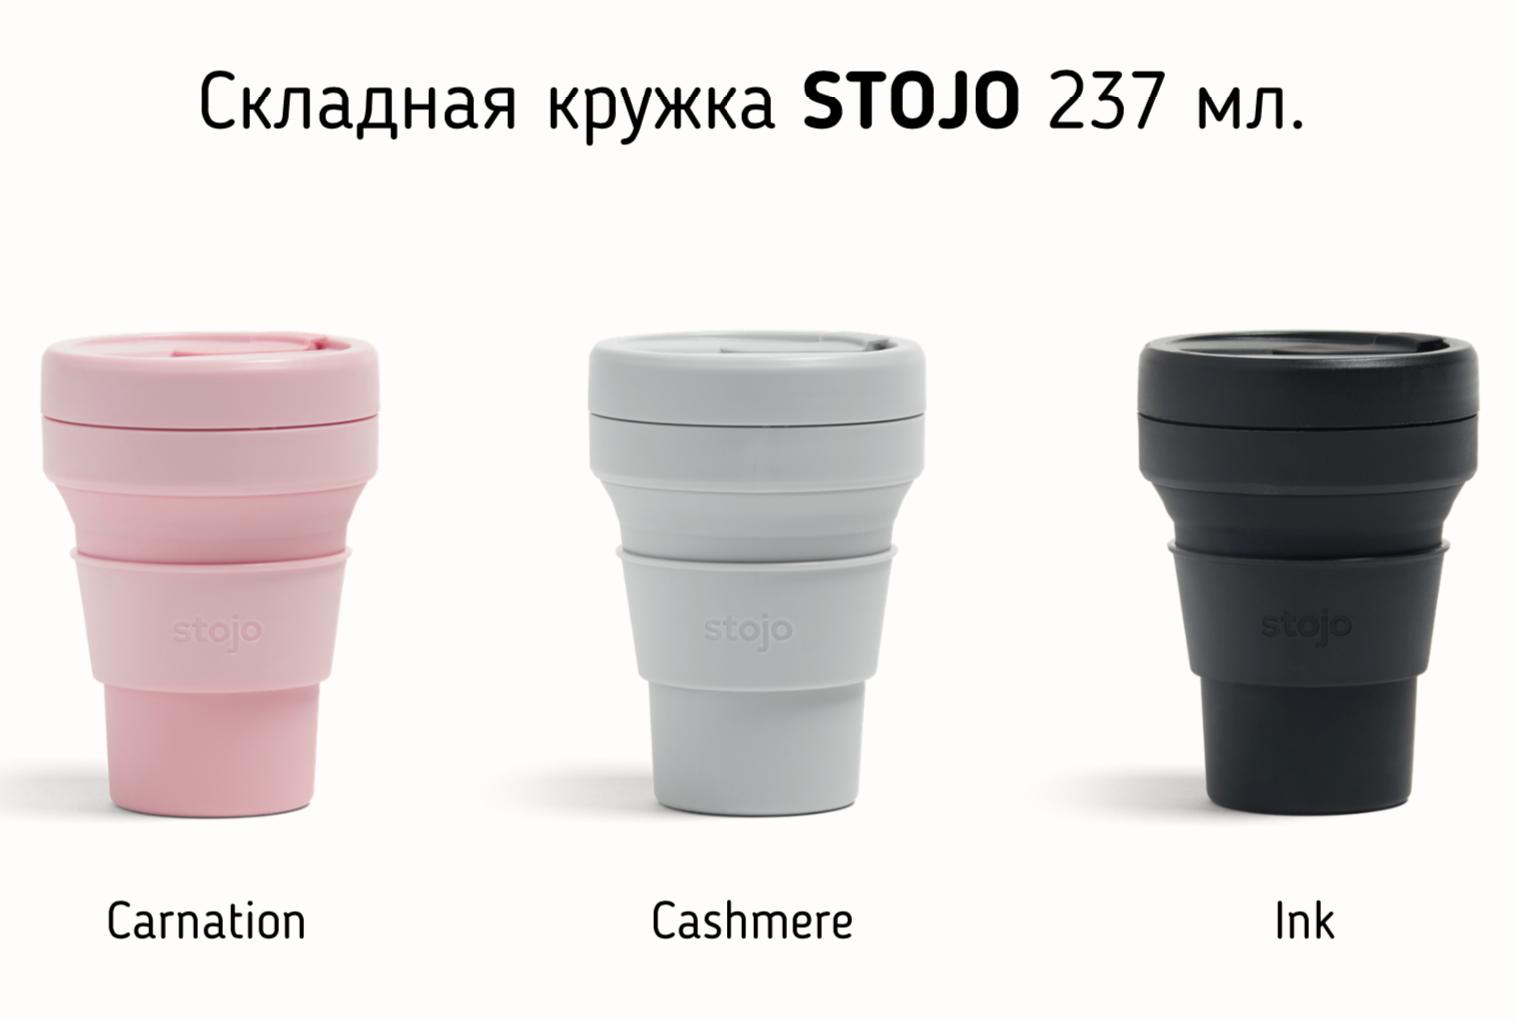 Складной стакан STOJO 237 мл, цвета Carnation, Cashmere, Ink